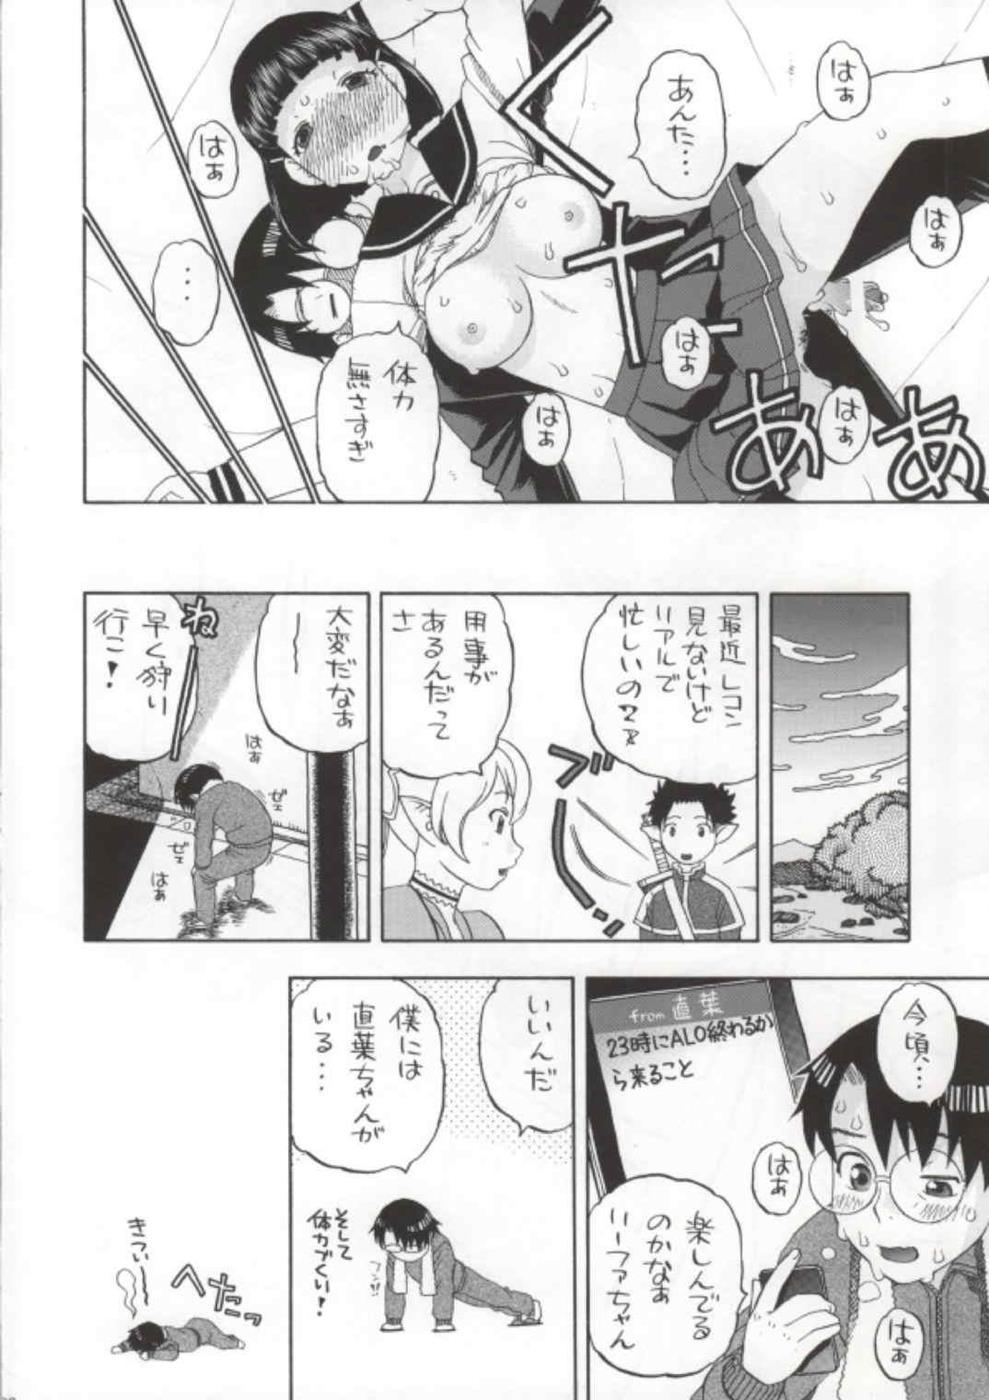 Suguha-chan ga Ikenain Dakara ne 28